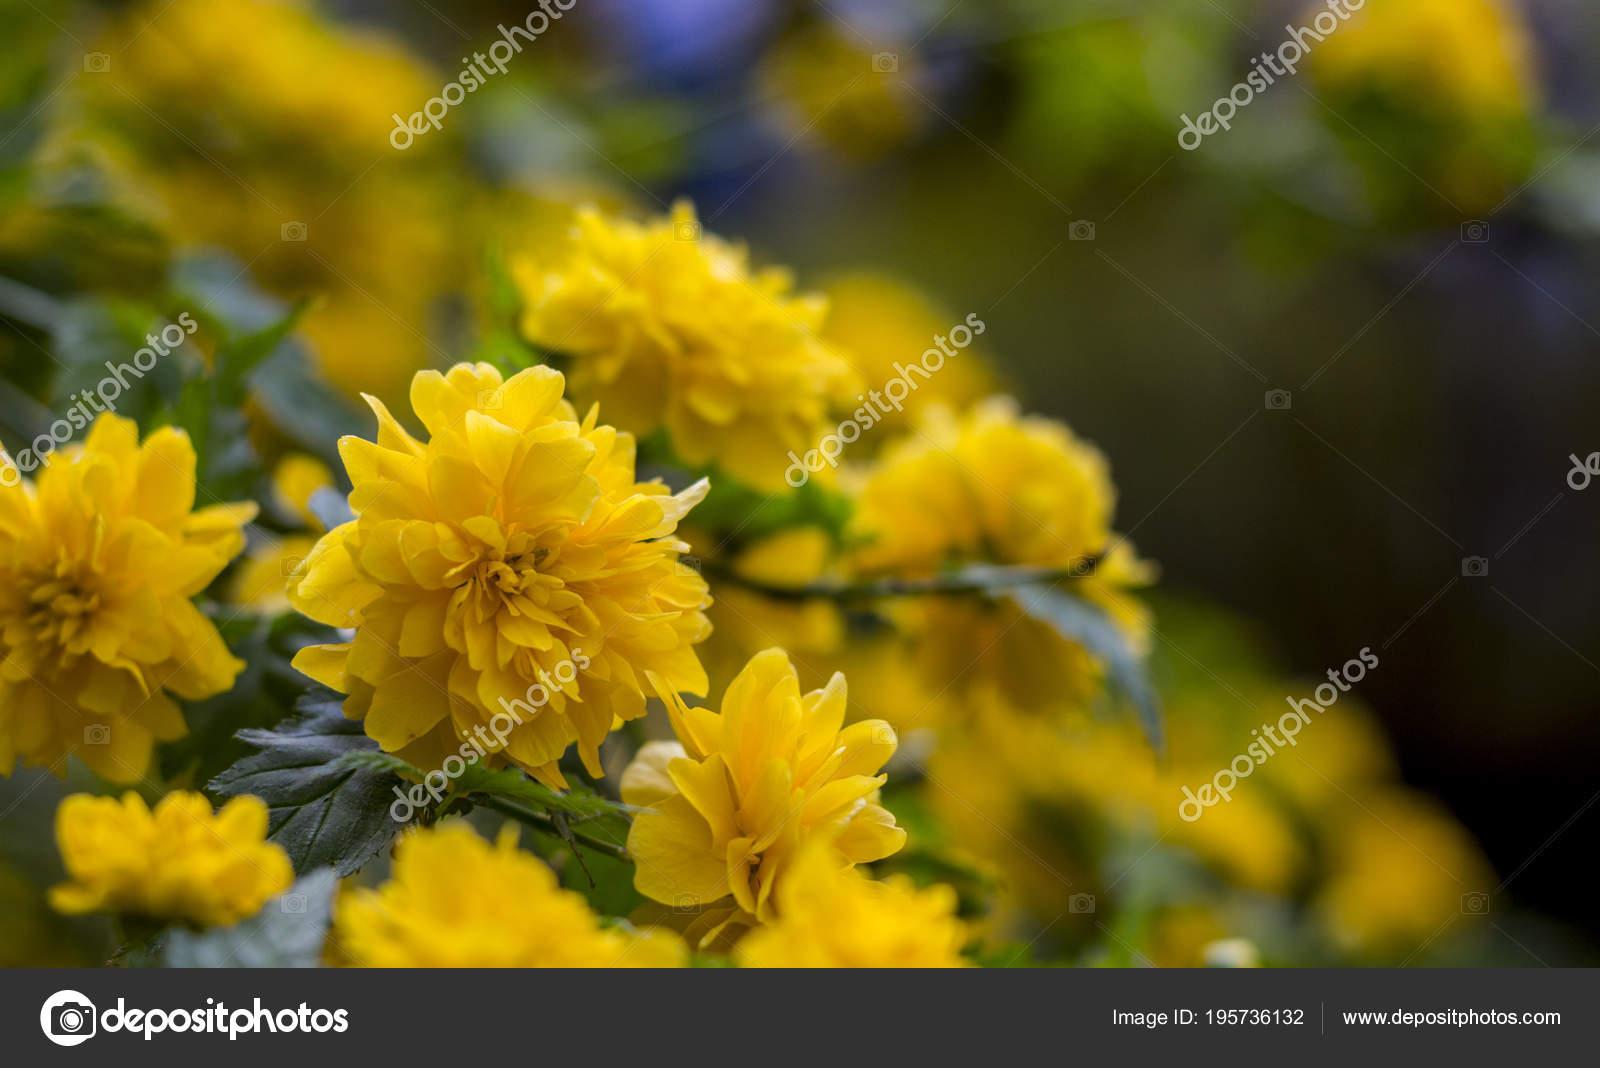 Kerria Japonica A Beautiful Yellow Flowering Shrub Stock Photo